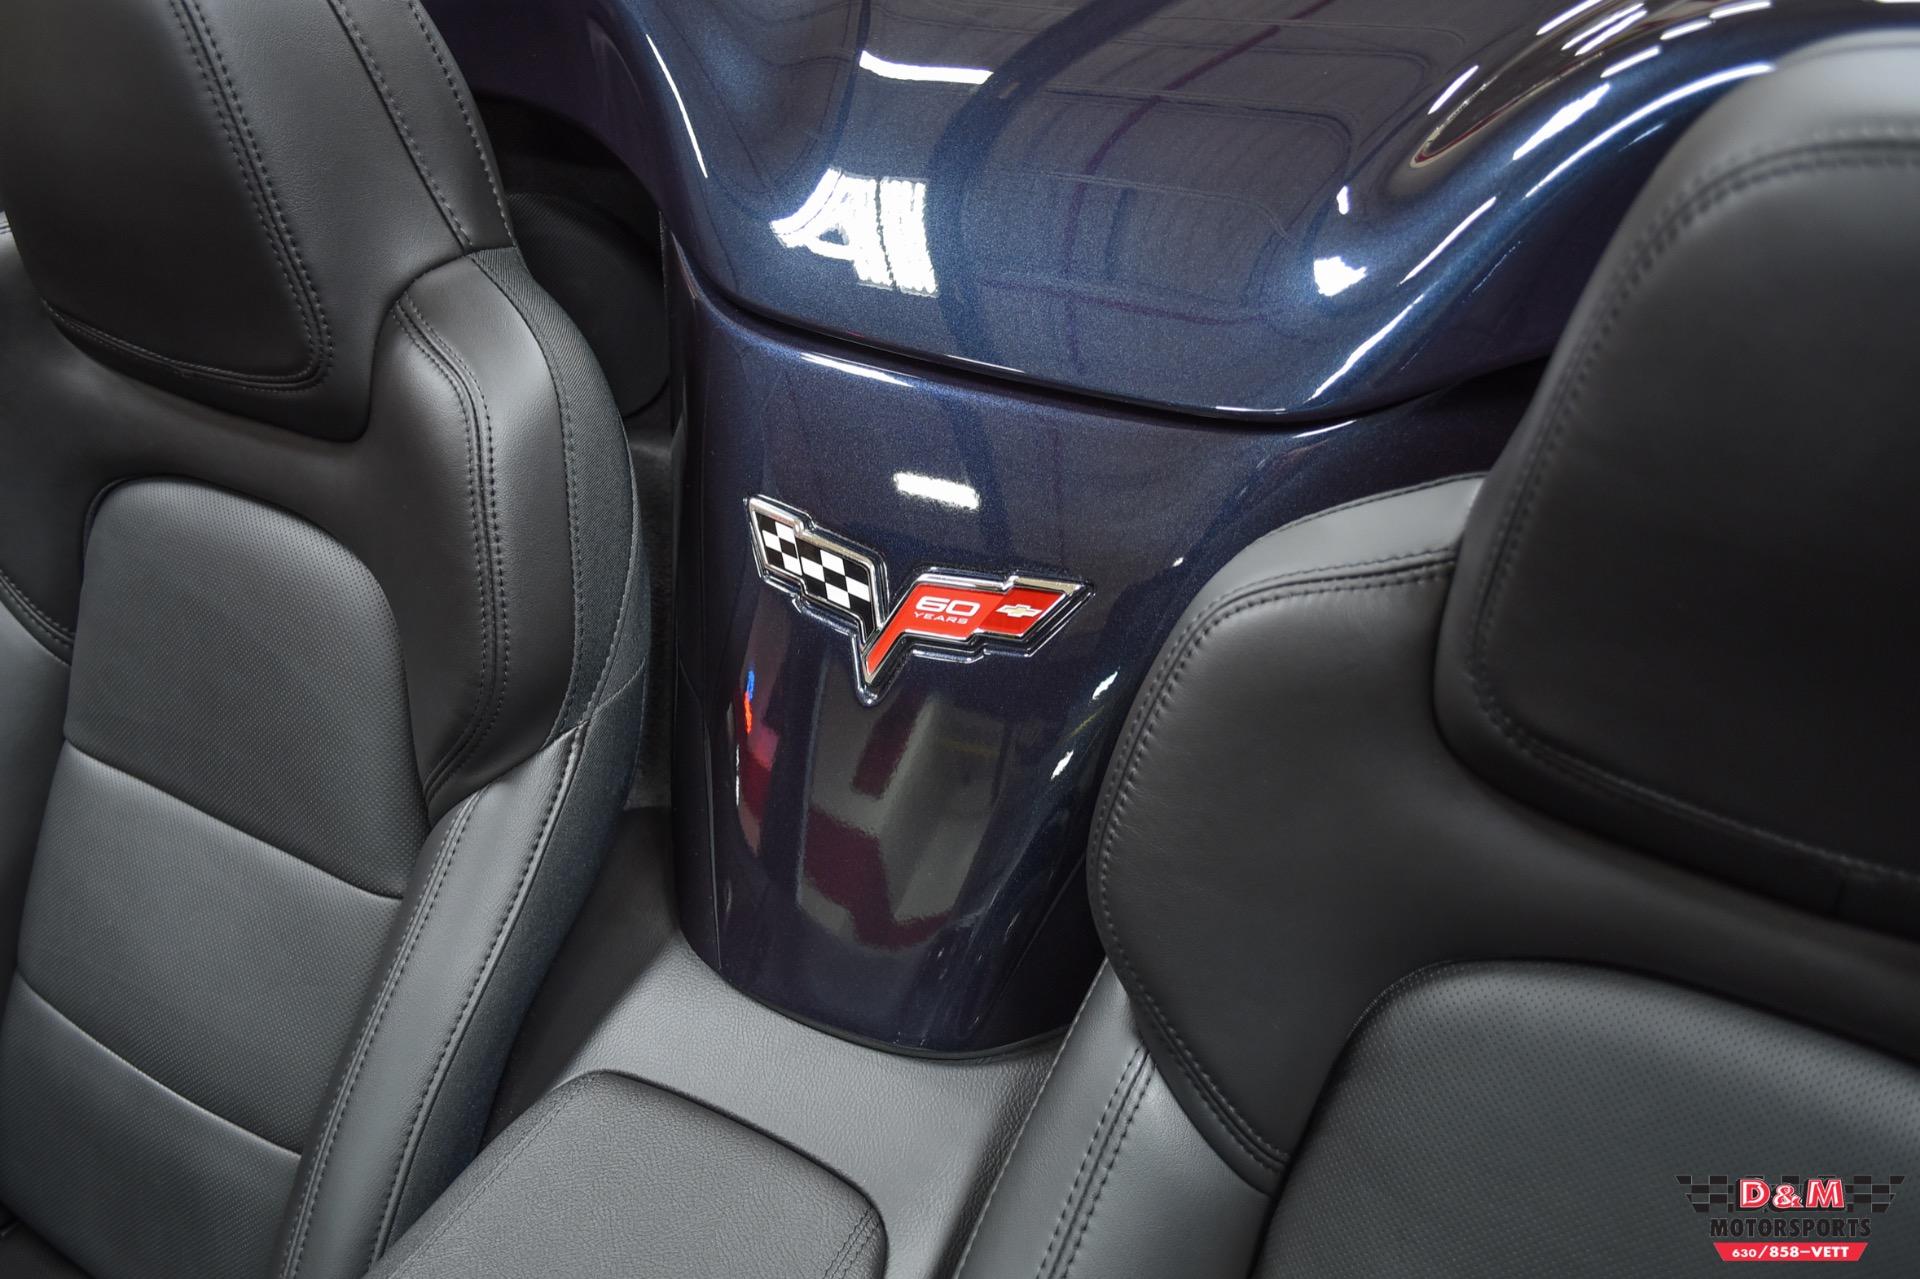 Used 2013 Chevrolet Corvette 427 Convertible   Glen Ellyn, IL